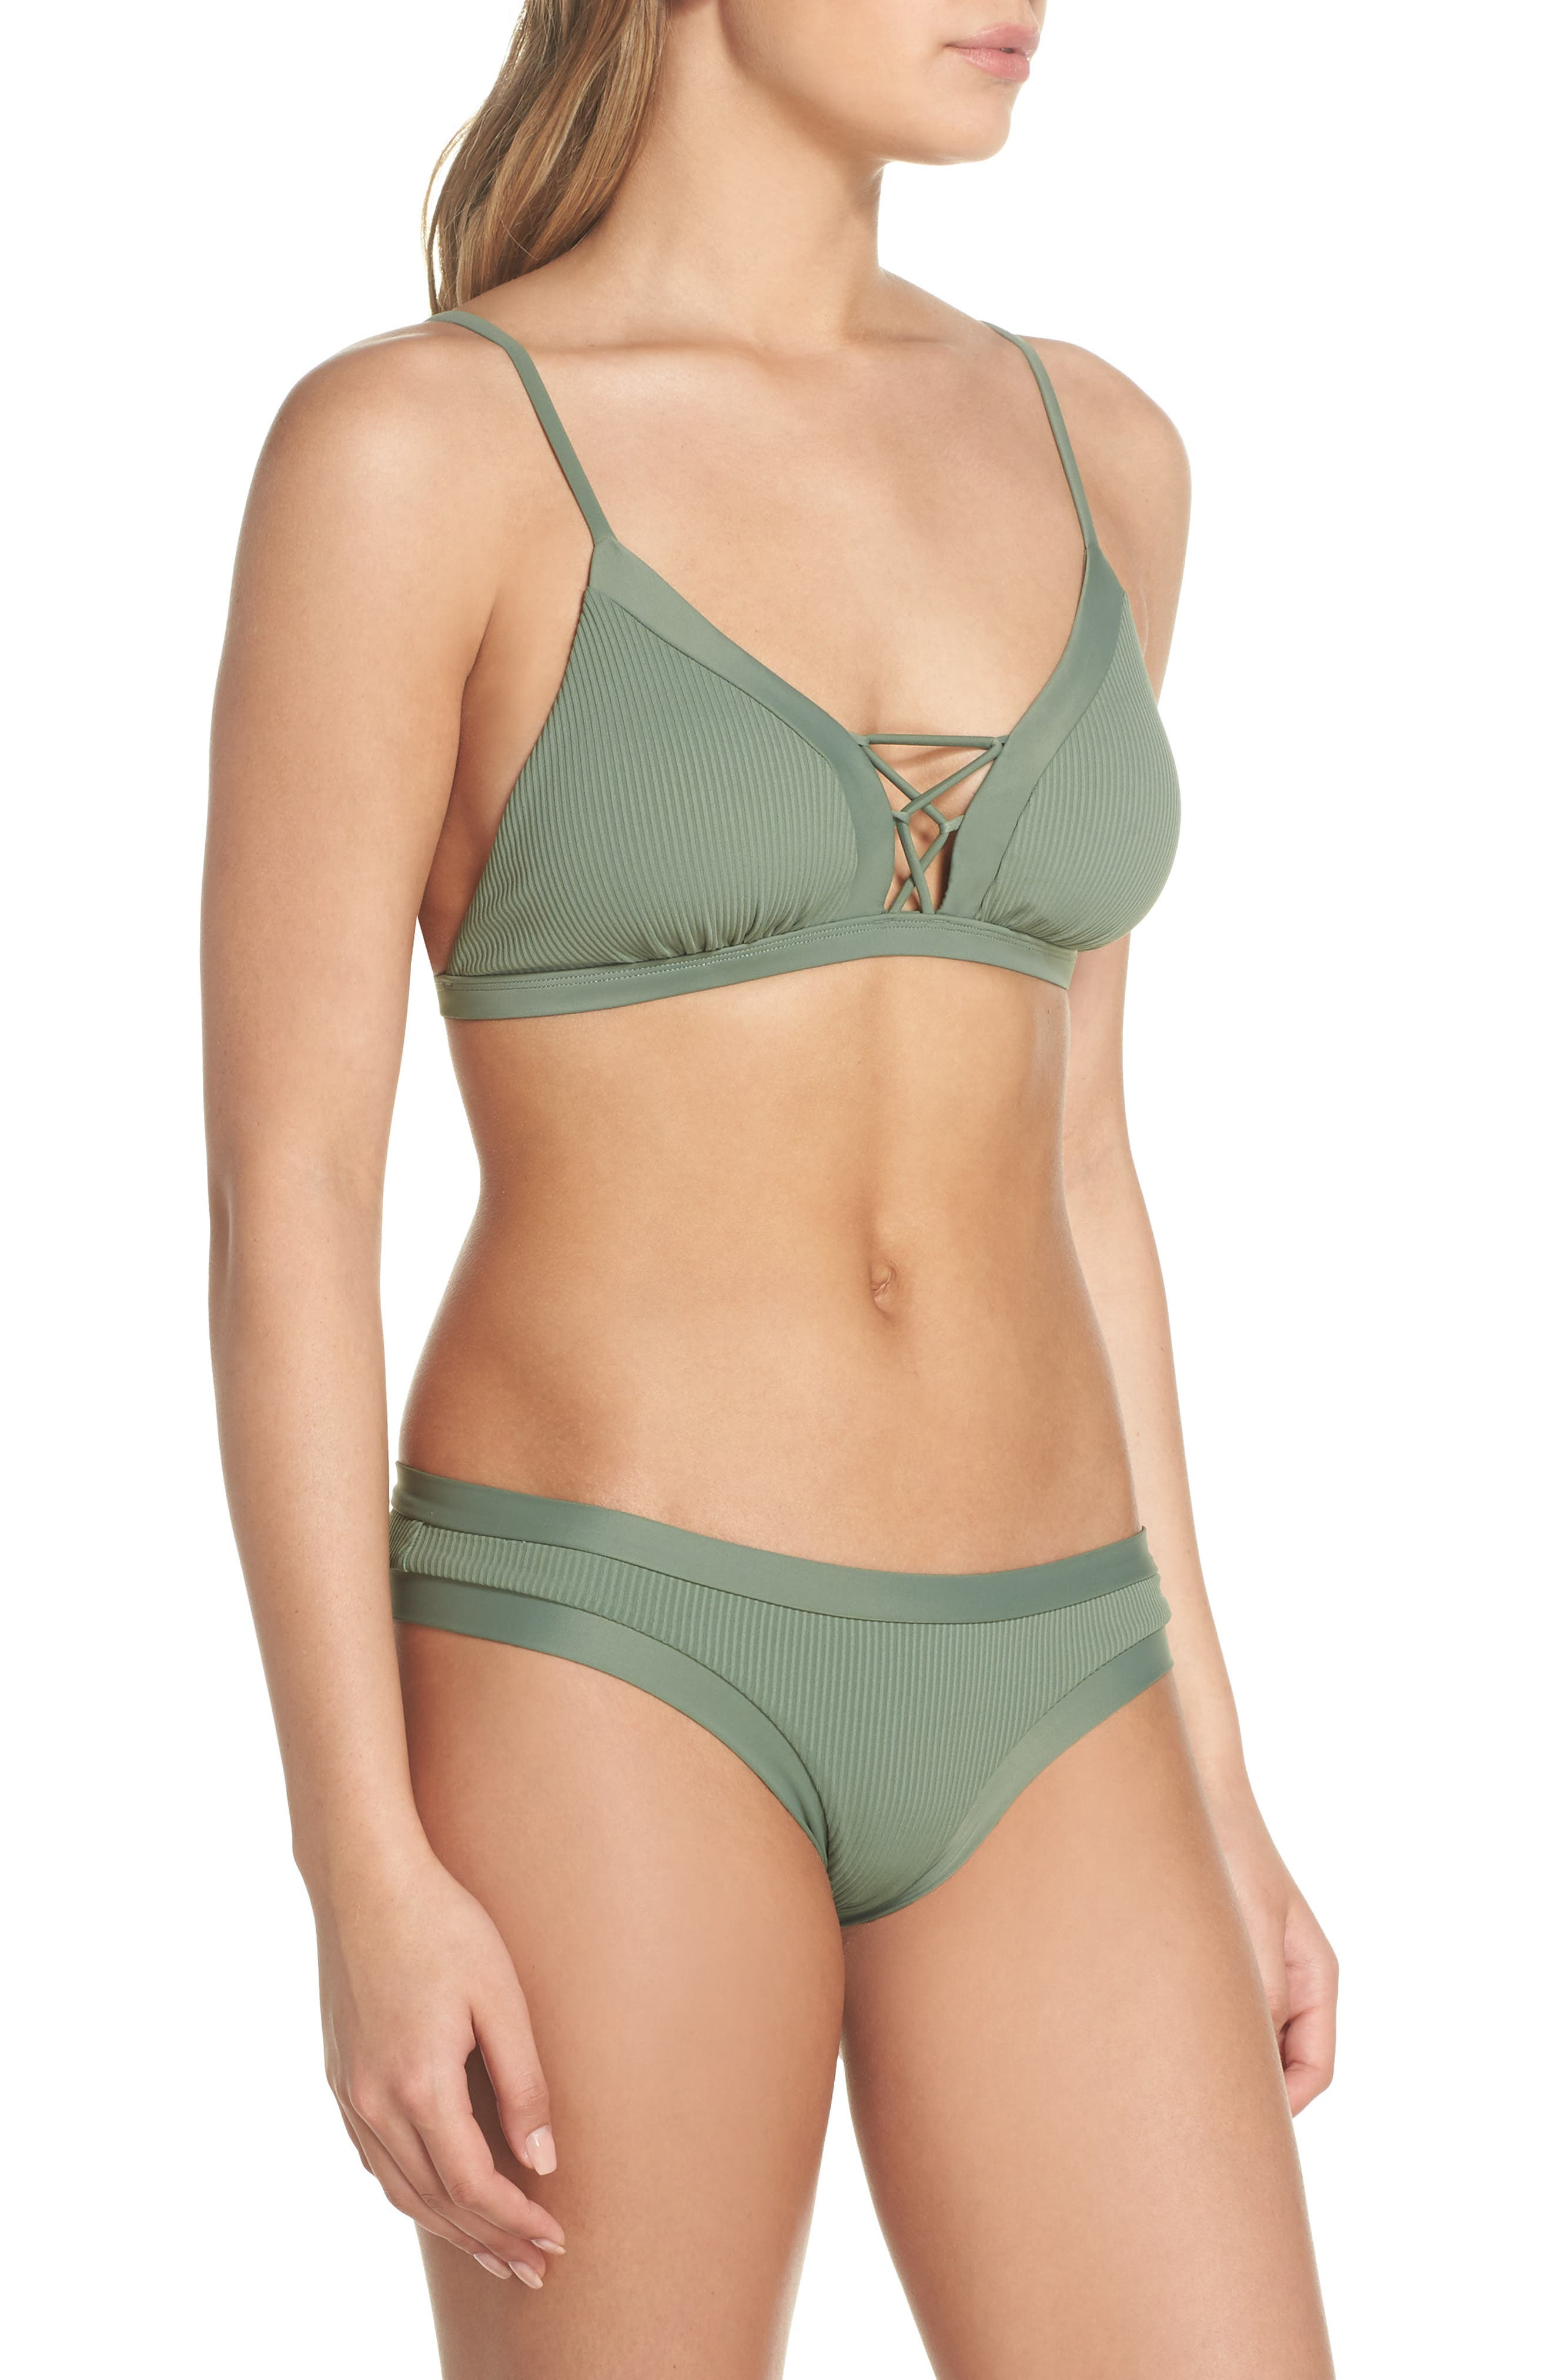 Ibiza Phoebe Bikini Top,                             Alternate thumbnail 8, color,                             Cactus